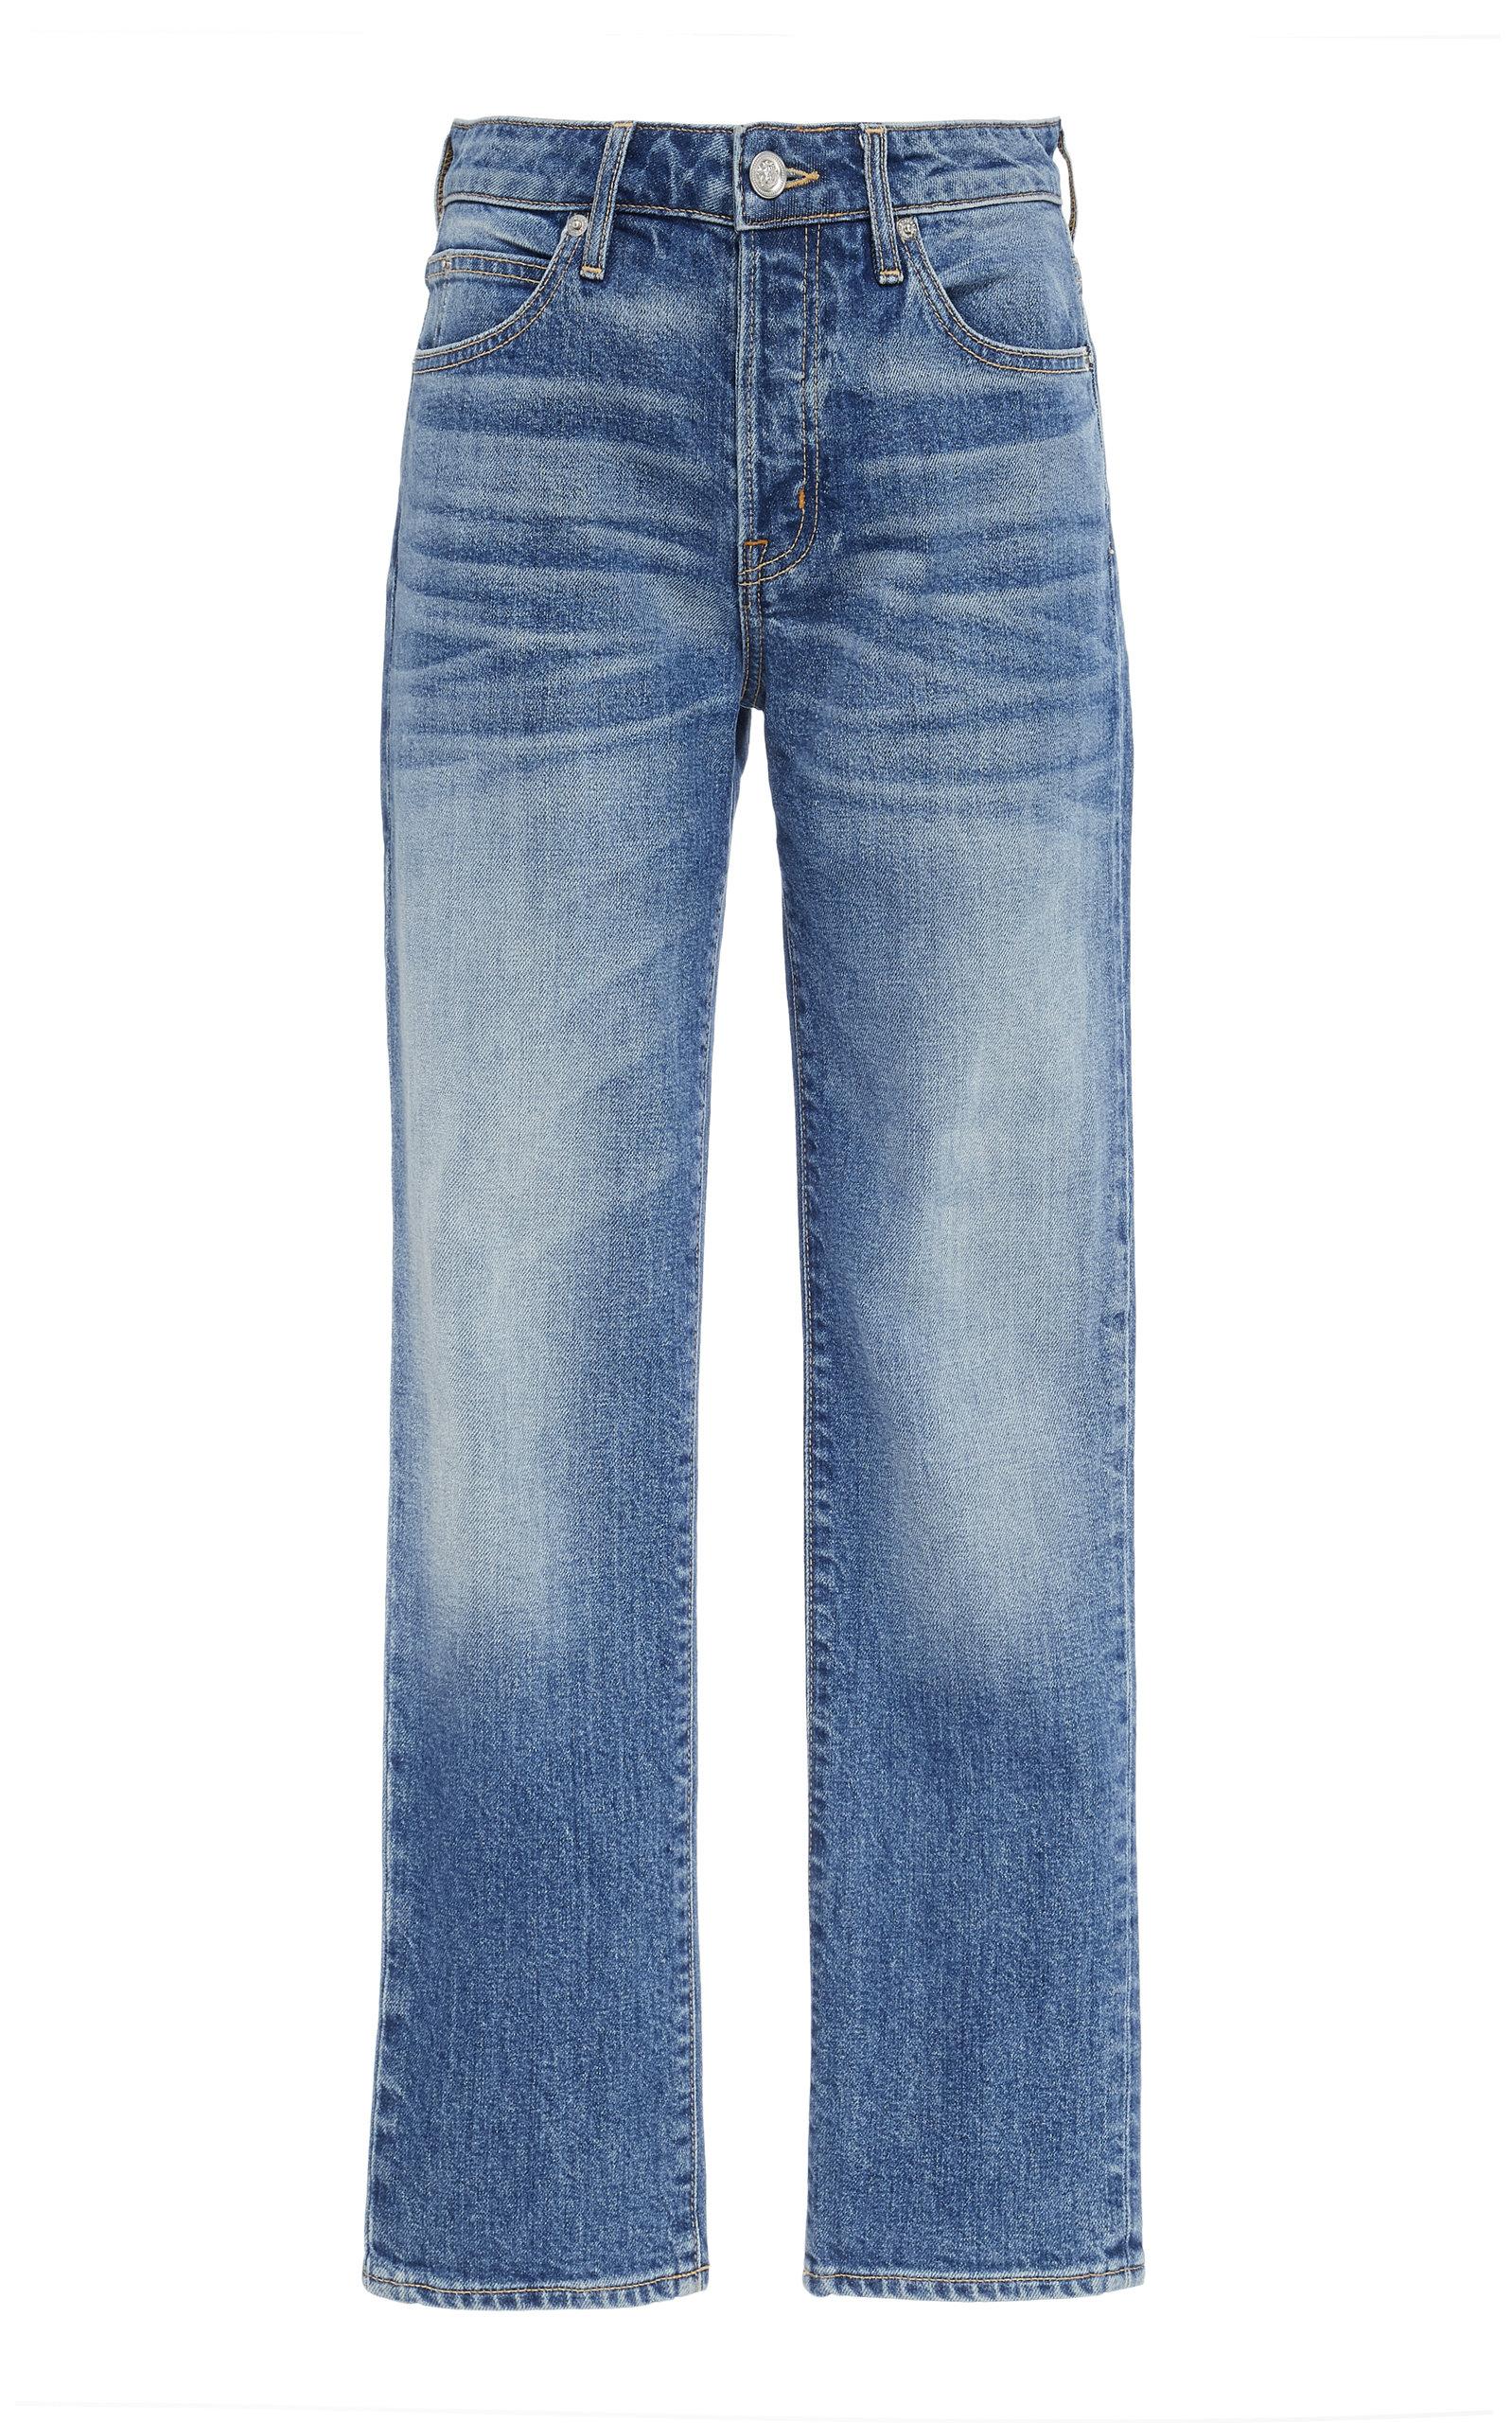 SLVRLAKE DENIM Lou Lou Mid-Rise Slim-Leg Jeans in Dark Wash